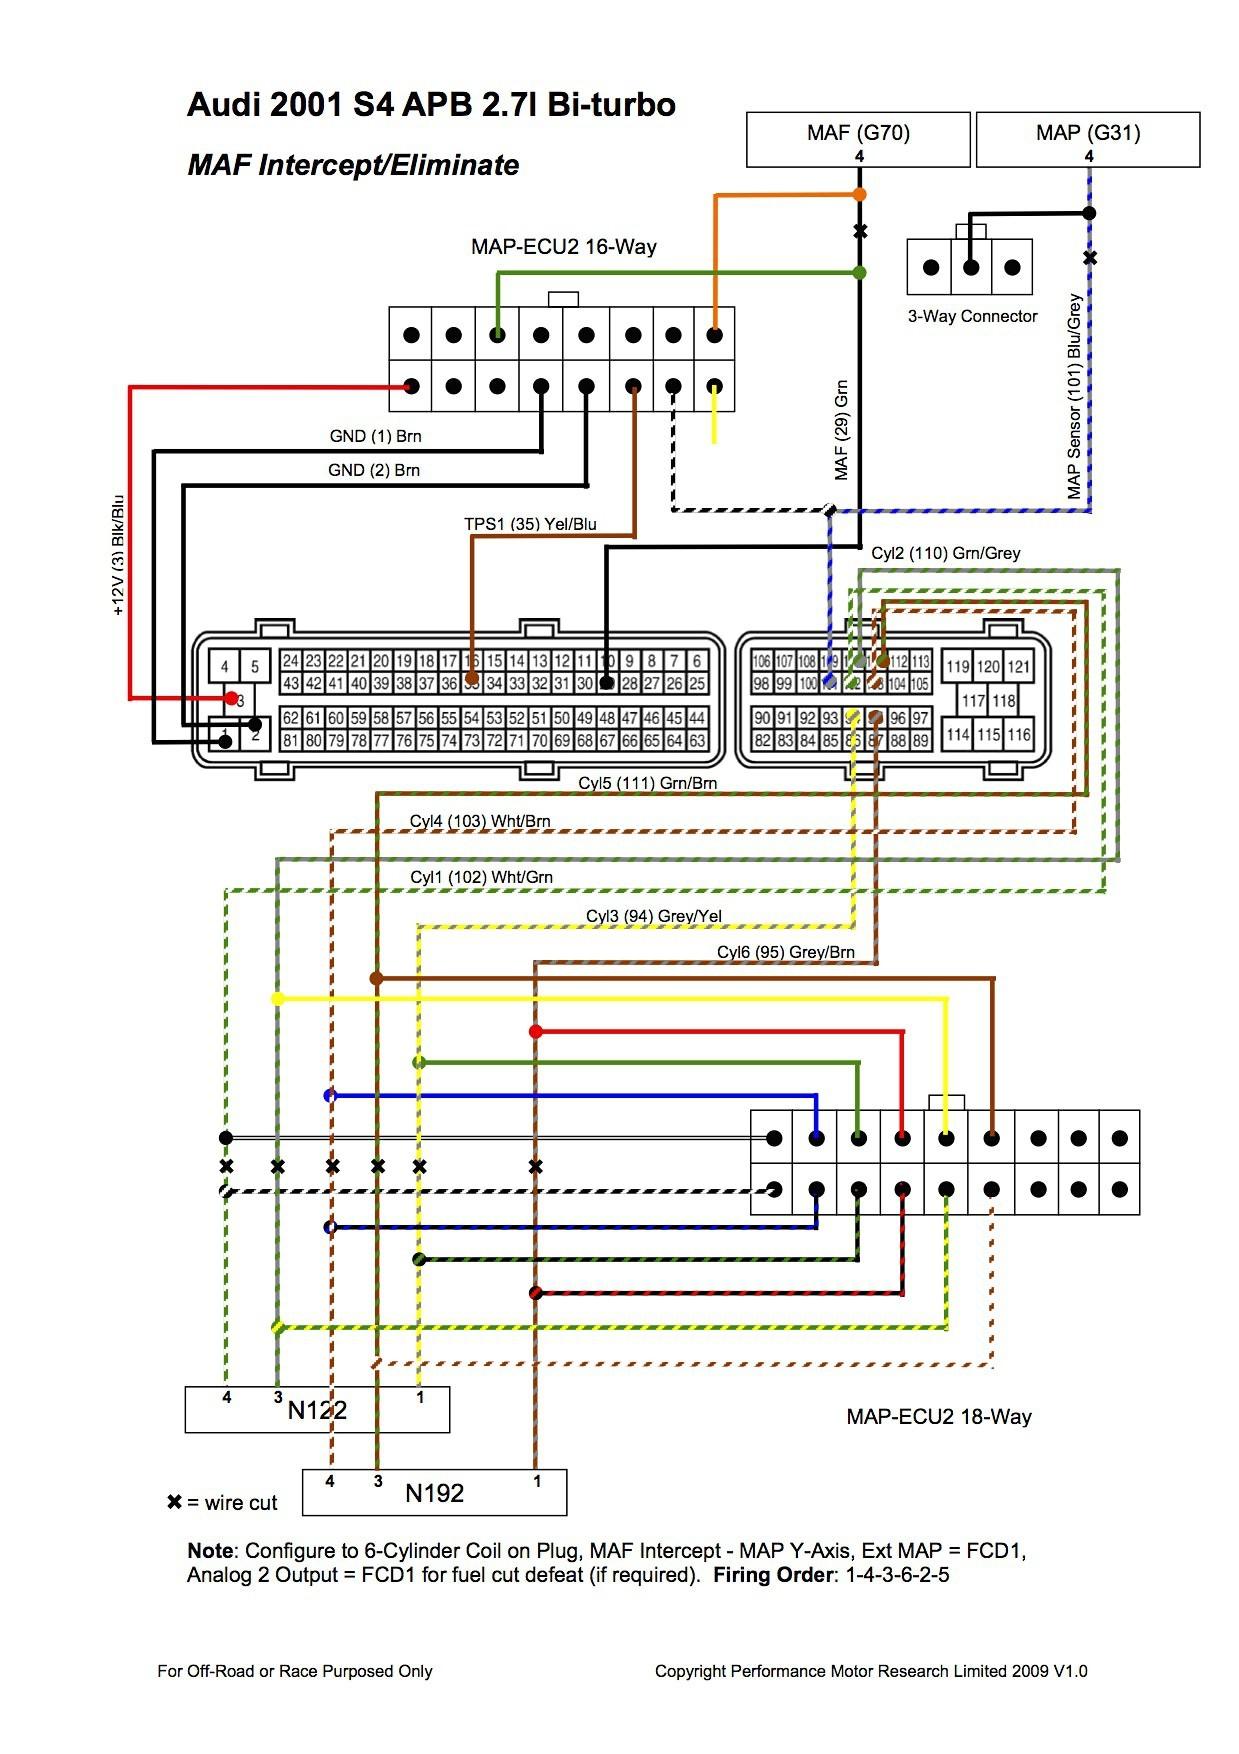 1990 ford Ranger Radio Wiring Diagram New ford F150 Radio Wiring Harness Diagram Wiring Of 1990 ford Ranger Radio Wiring Diagram